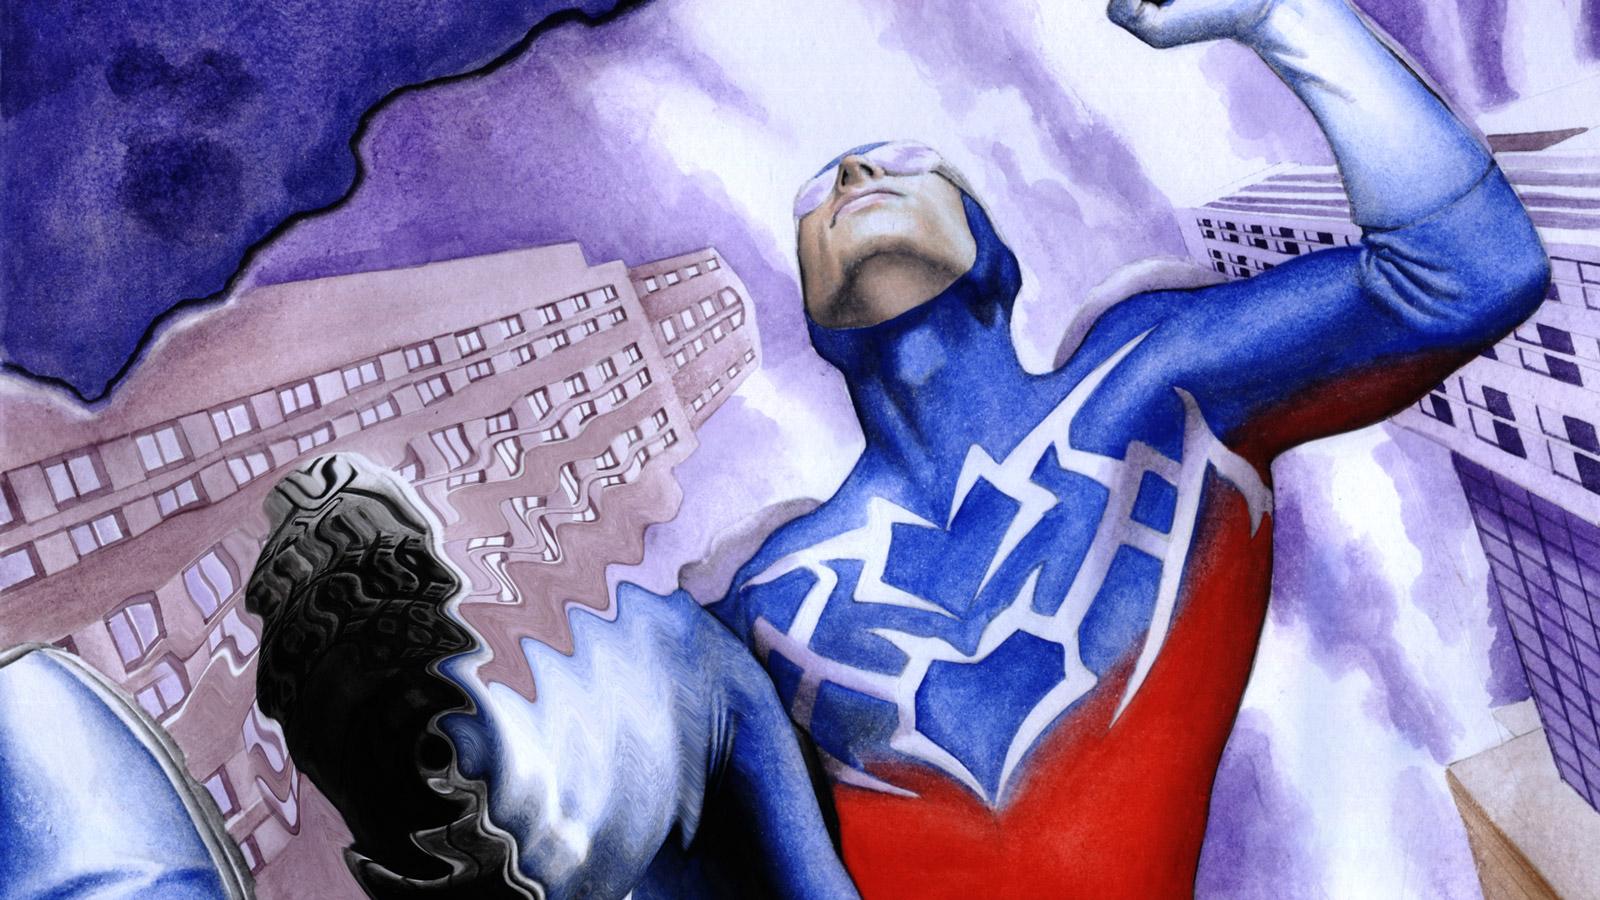 Free City of Heroes Wallpaper in 1600x900